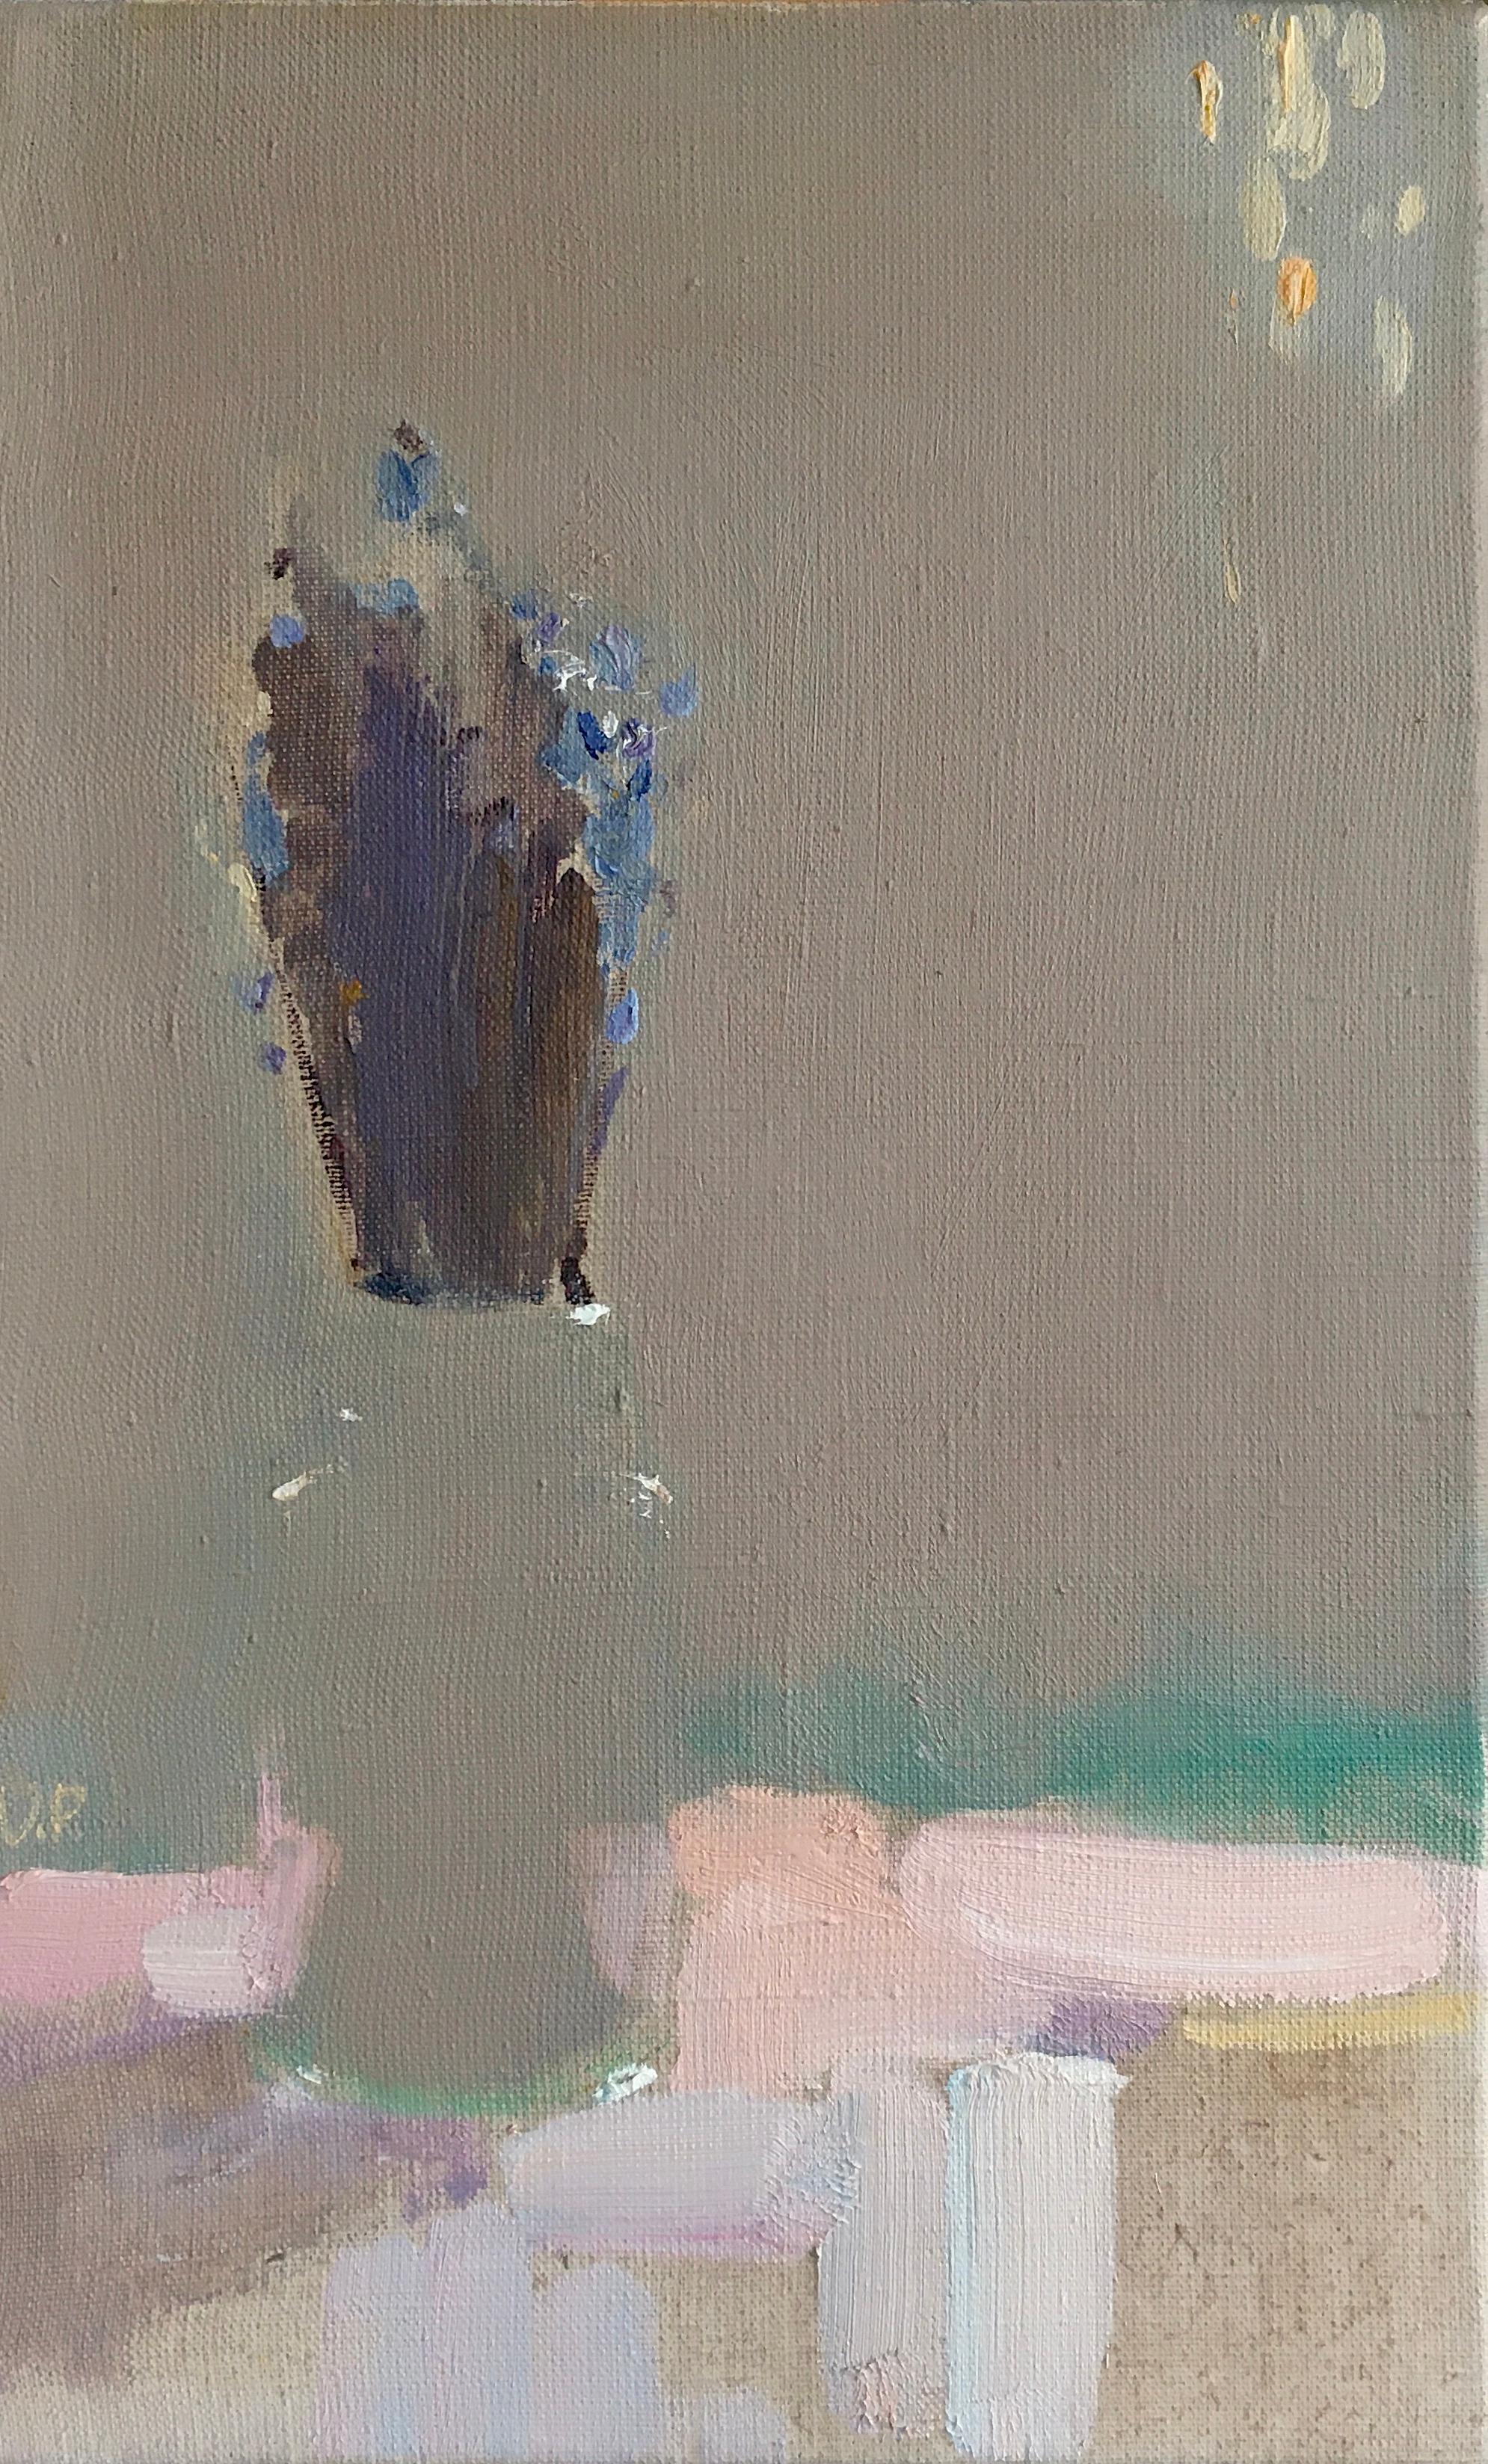 Lavender - 21st Century Contemporary Impressionist Minimalist Oil Painting